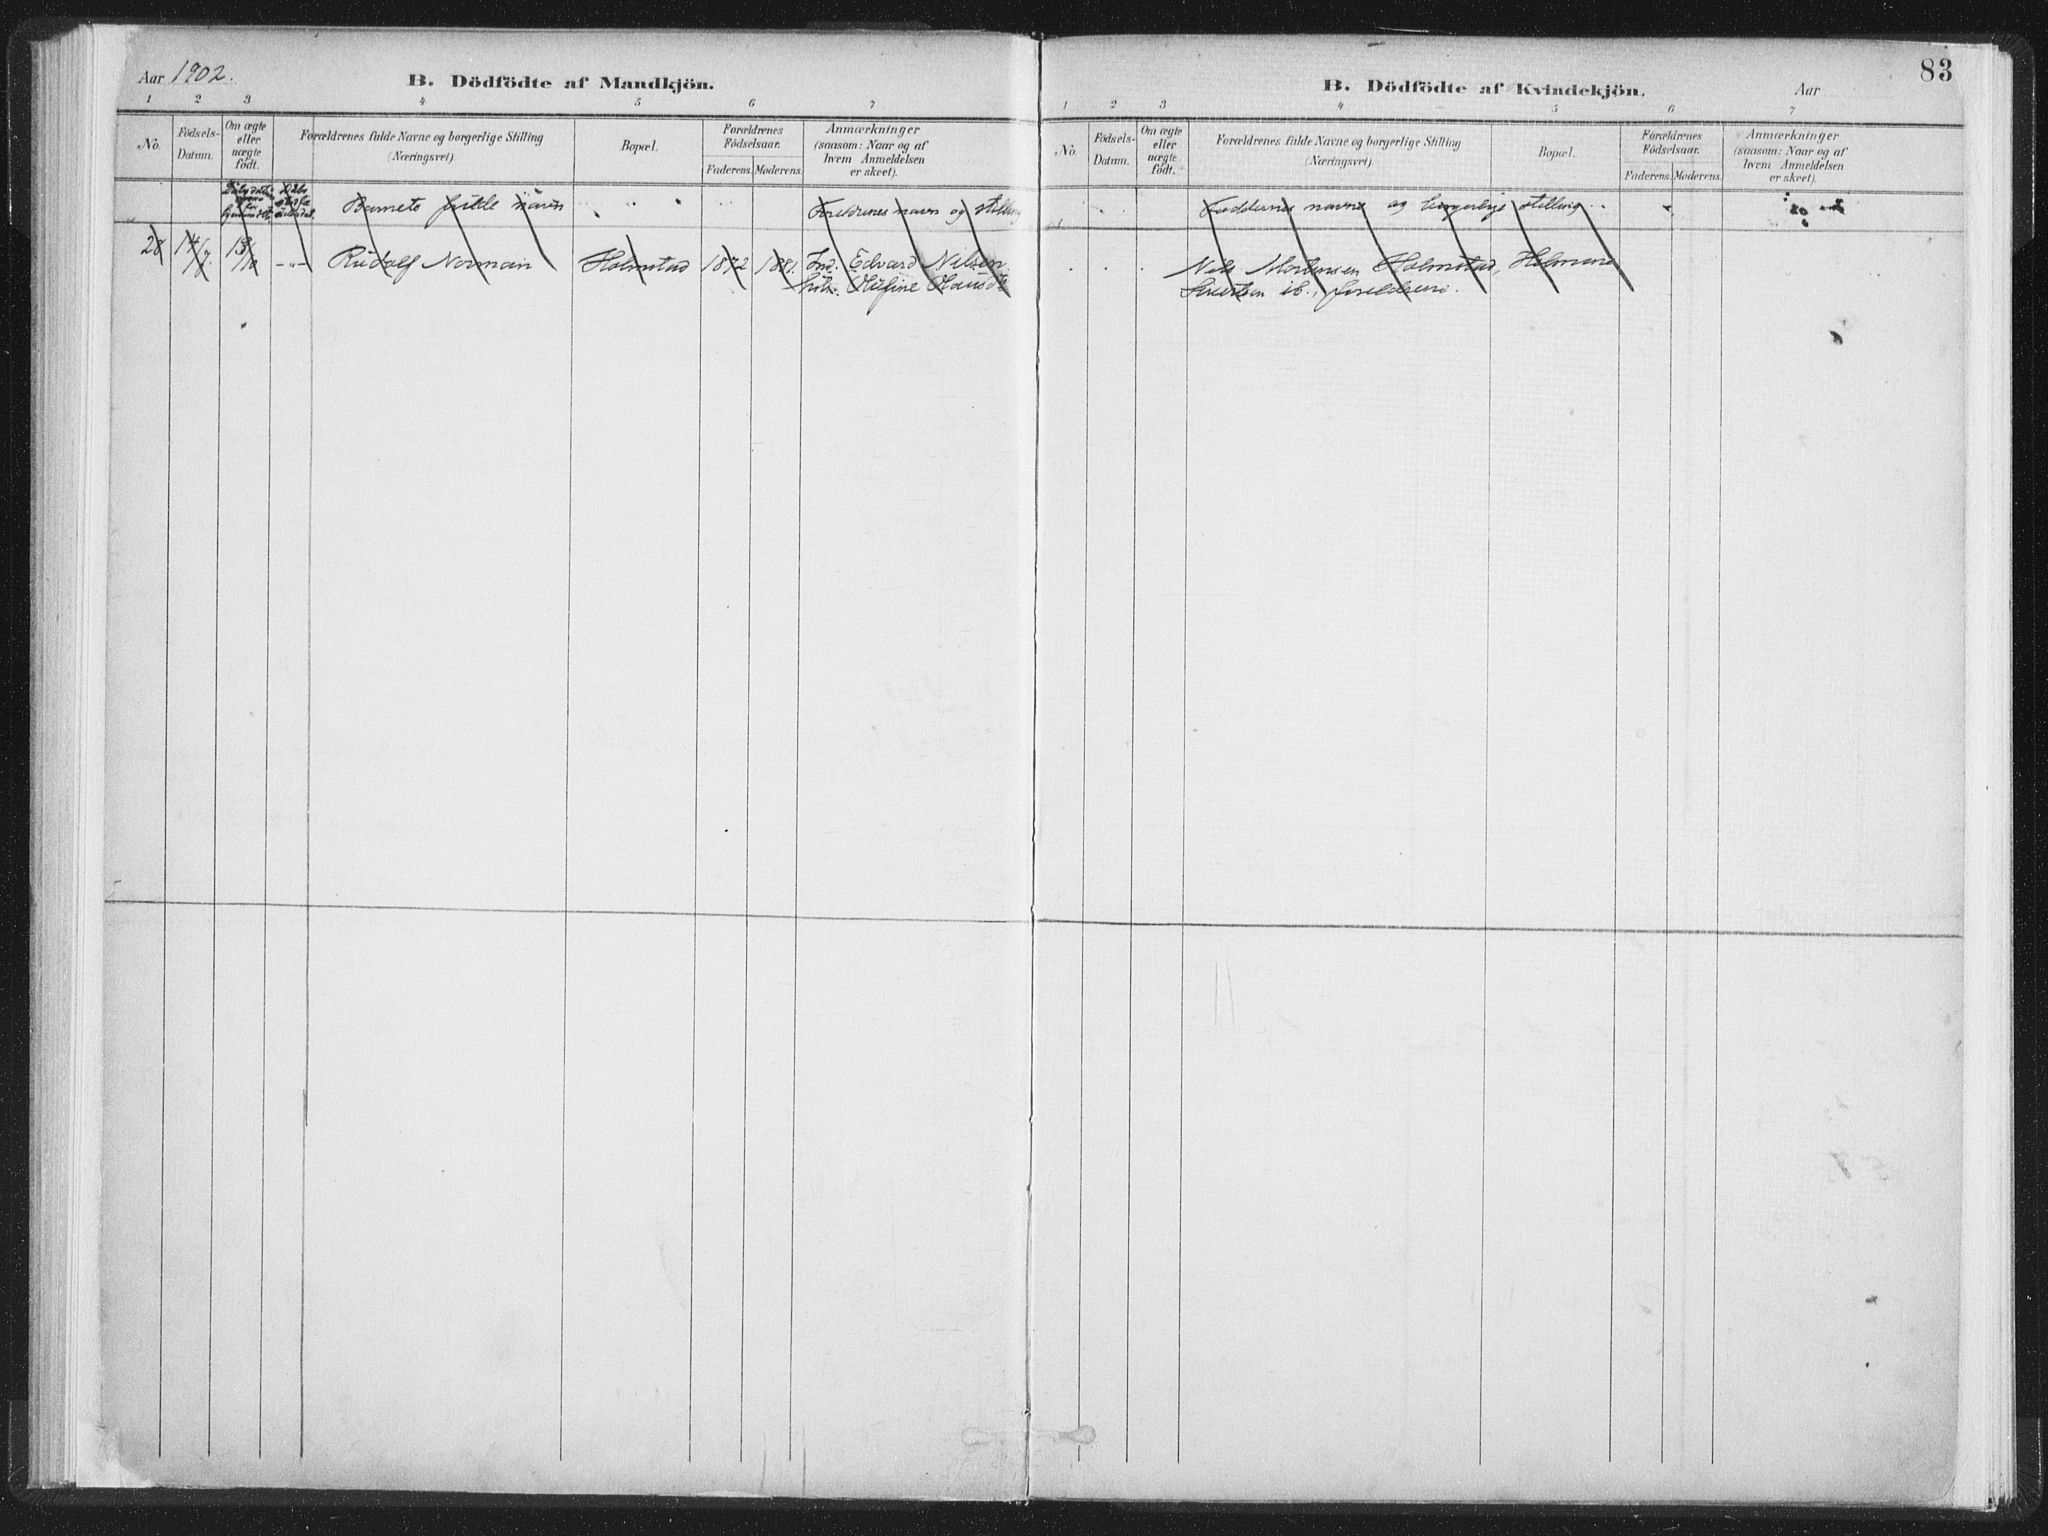 SAT, Ministerialprotokoller, klokkerbøker og fødselsregistre - Nordland, 890/L1286: Ministerialbok nr. 890A01, 1882-1902, s. 83